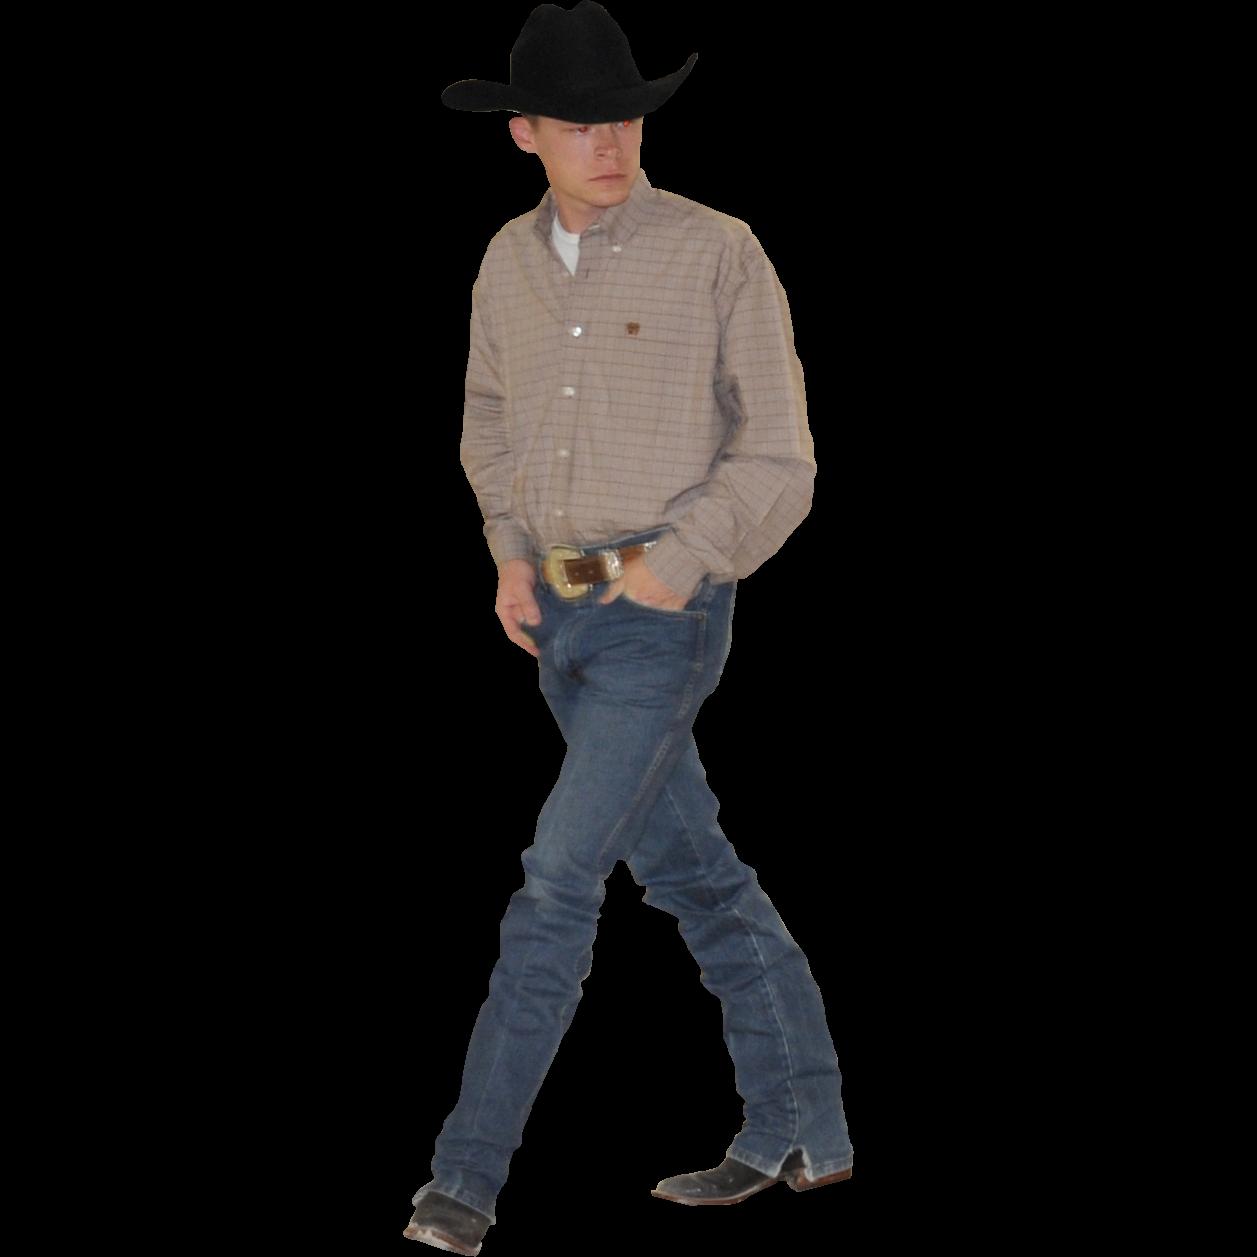 Cowboy PNG Image